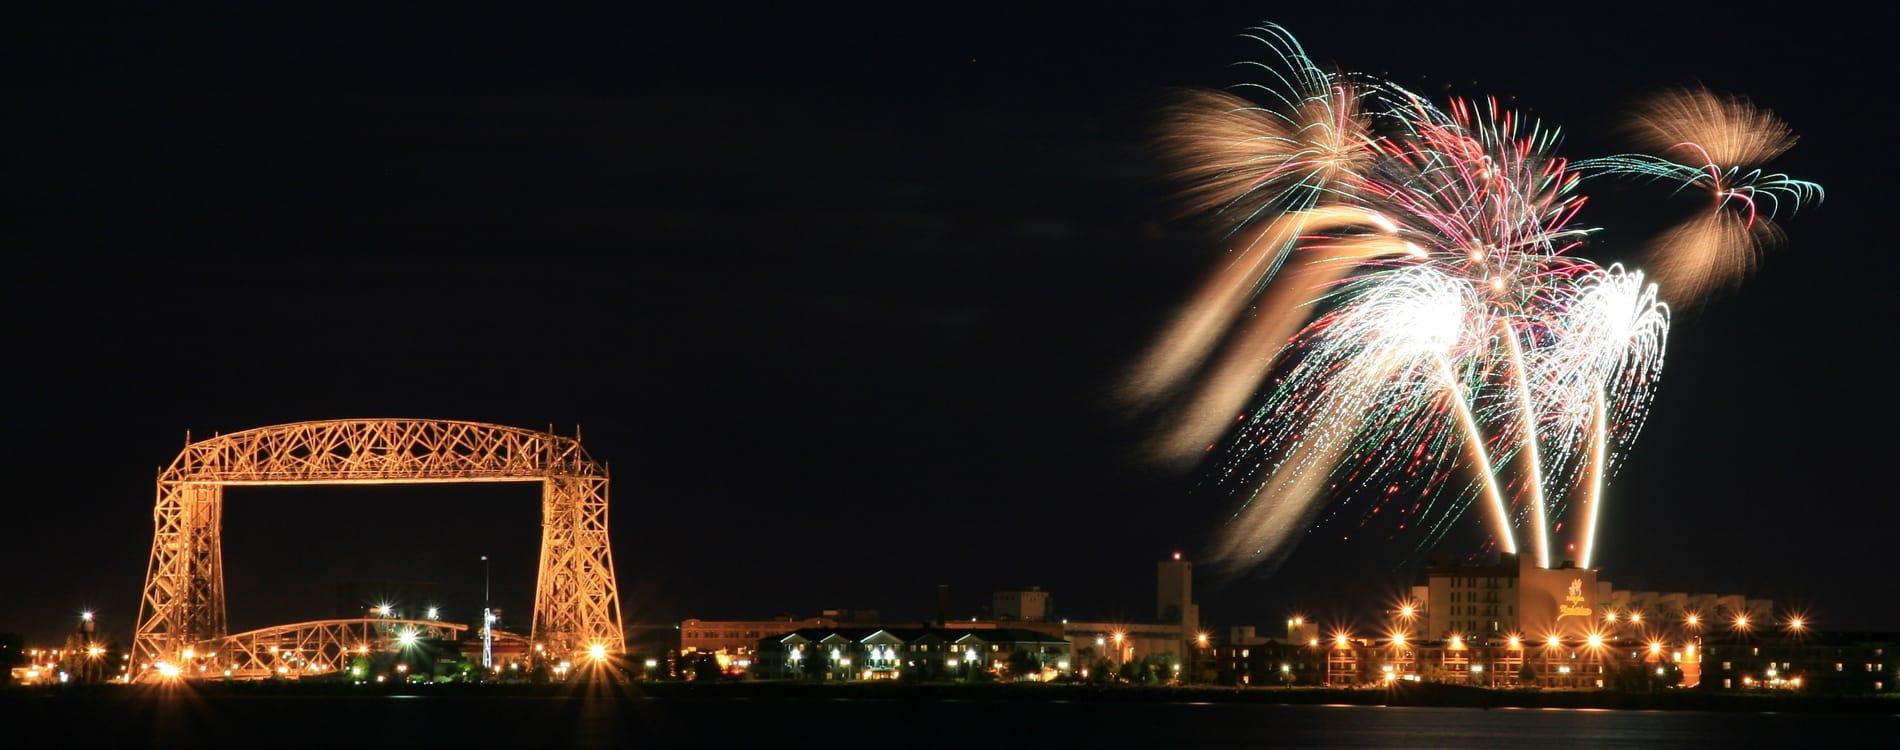 Duluth, MN - Fireworks